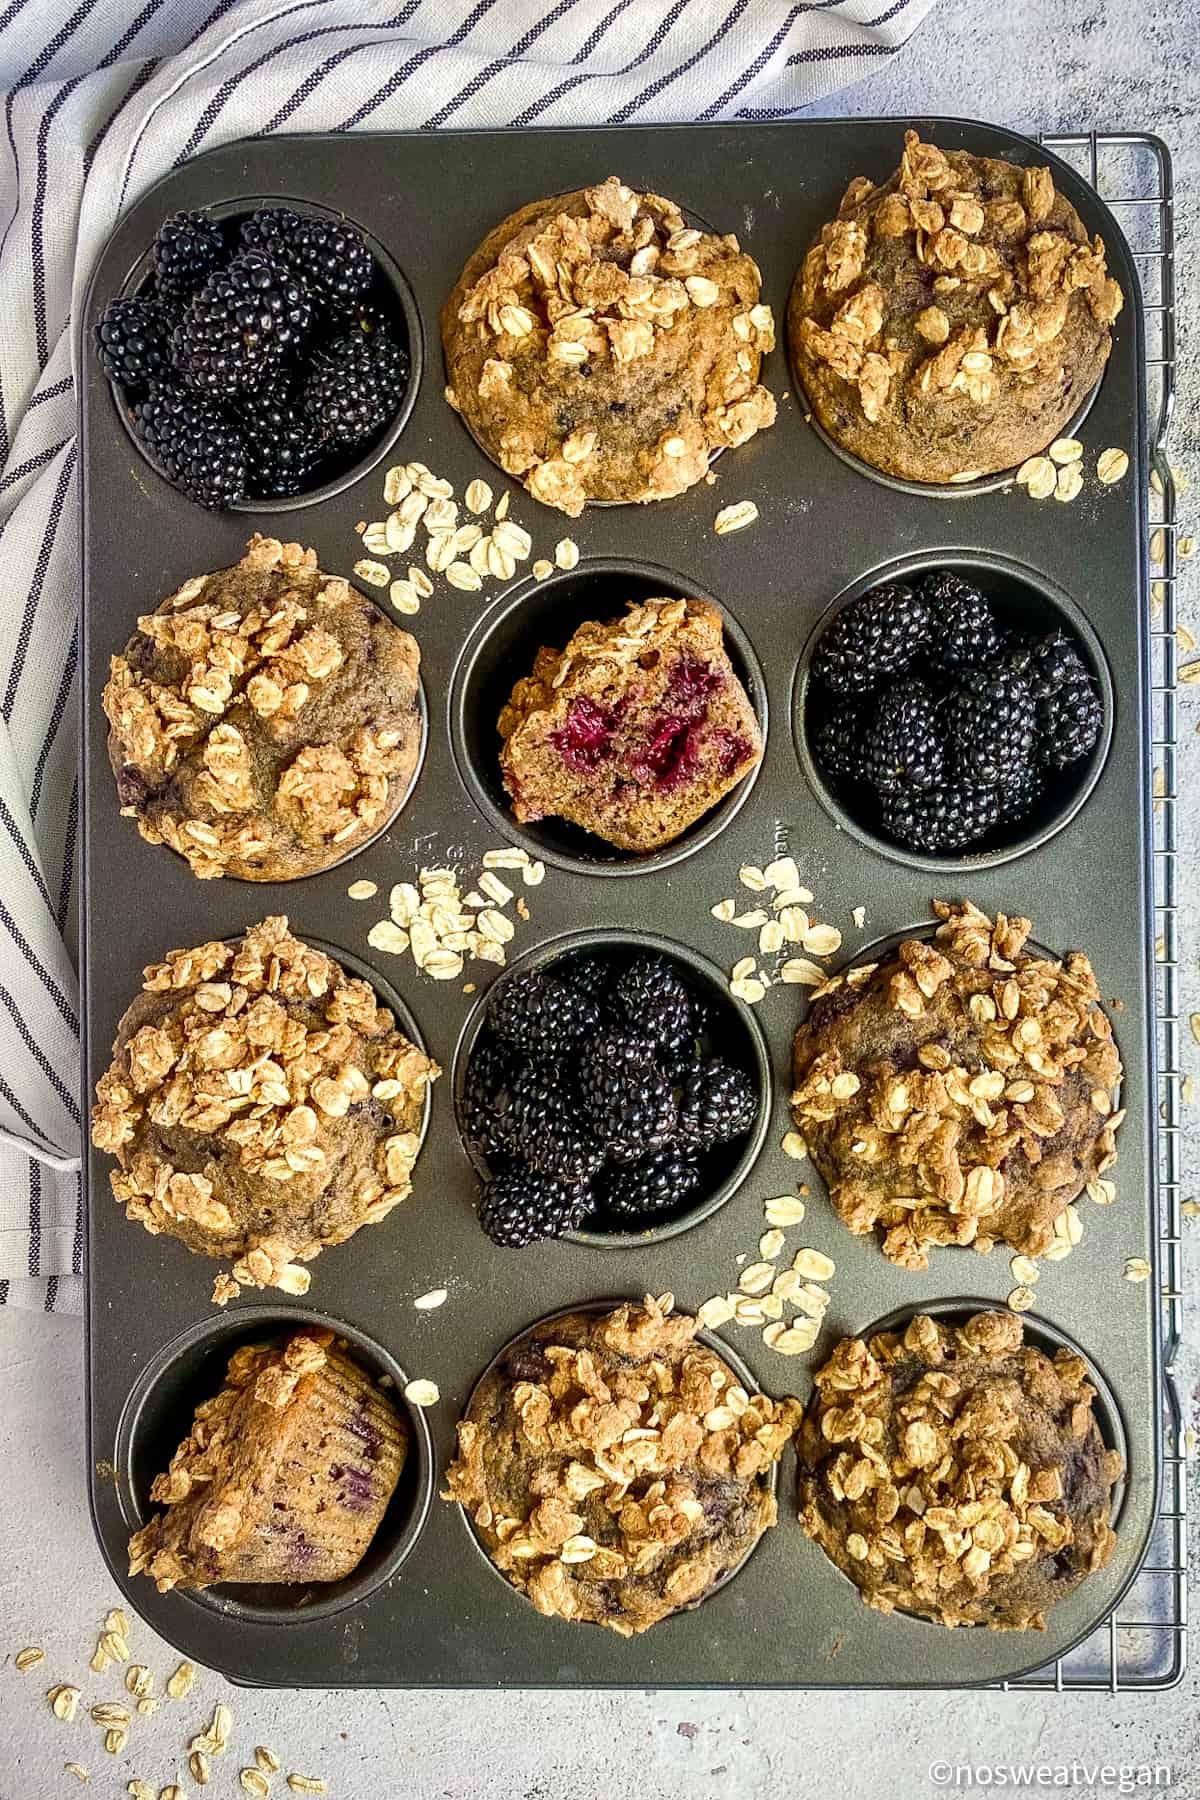 Vegan blackberry muffins in muffin tin with blackberries.